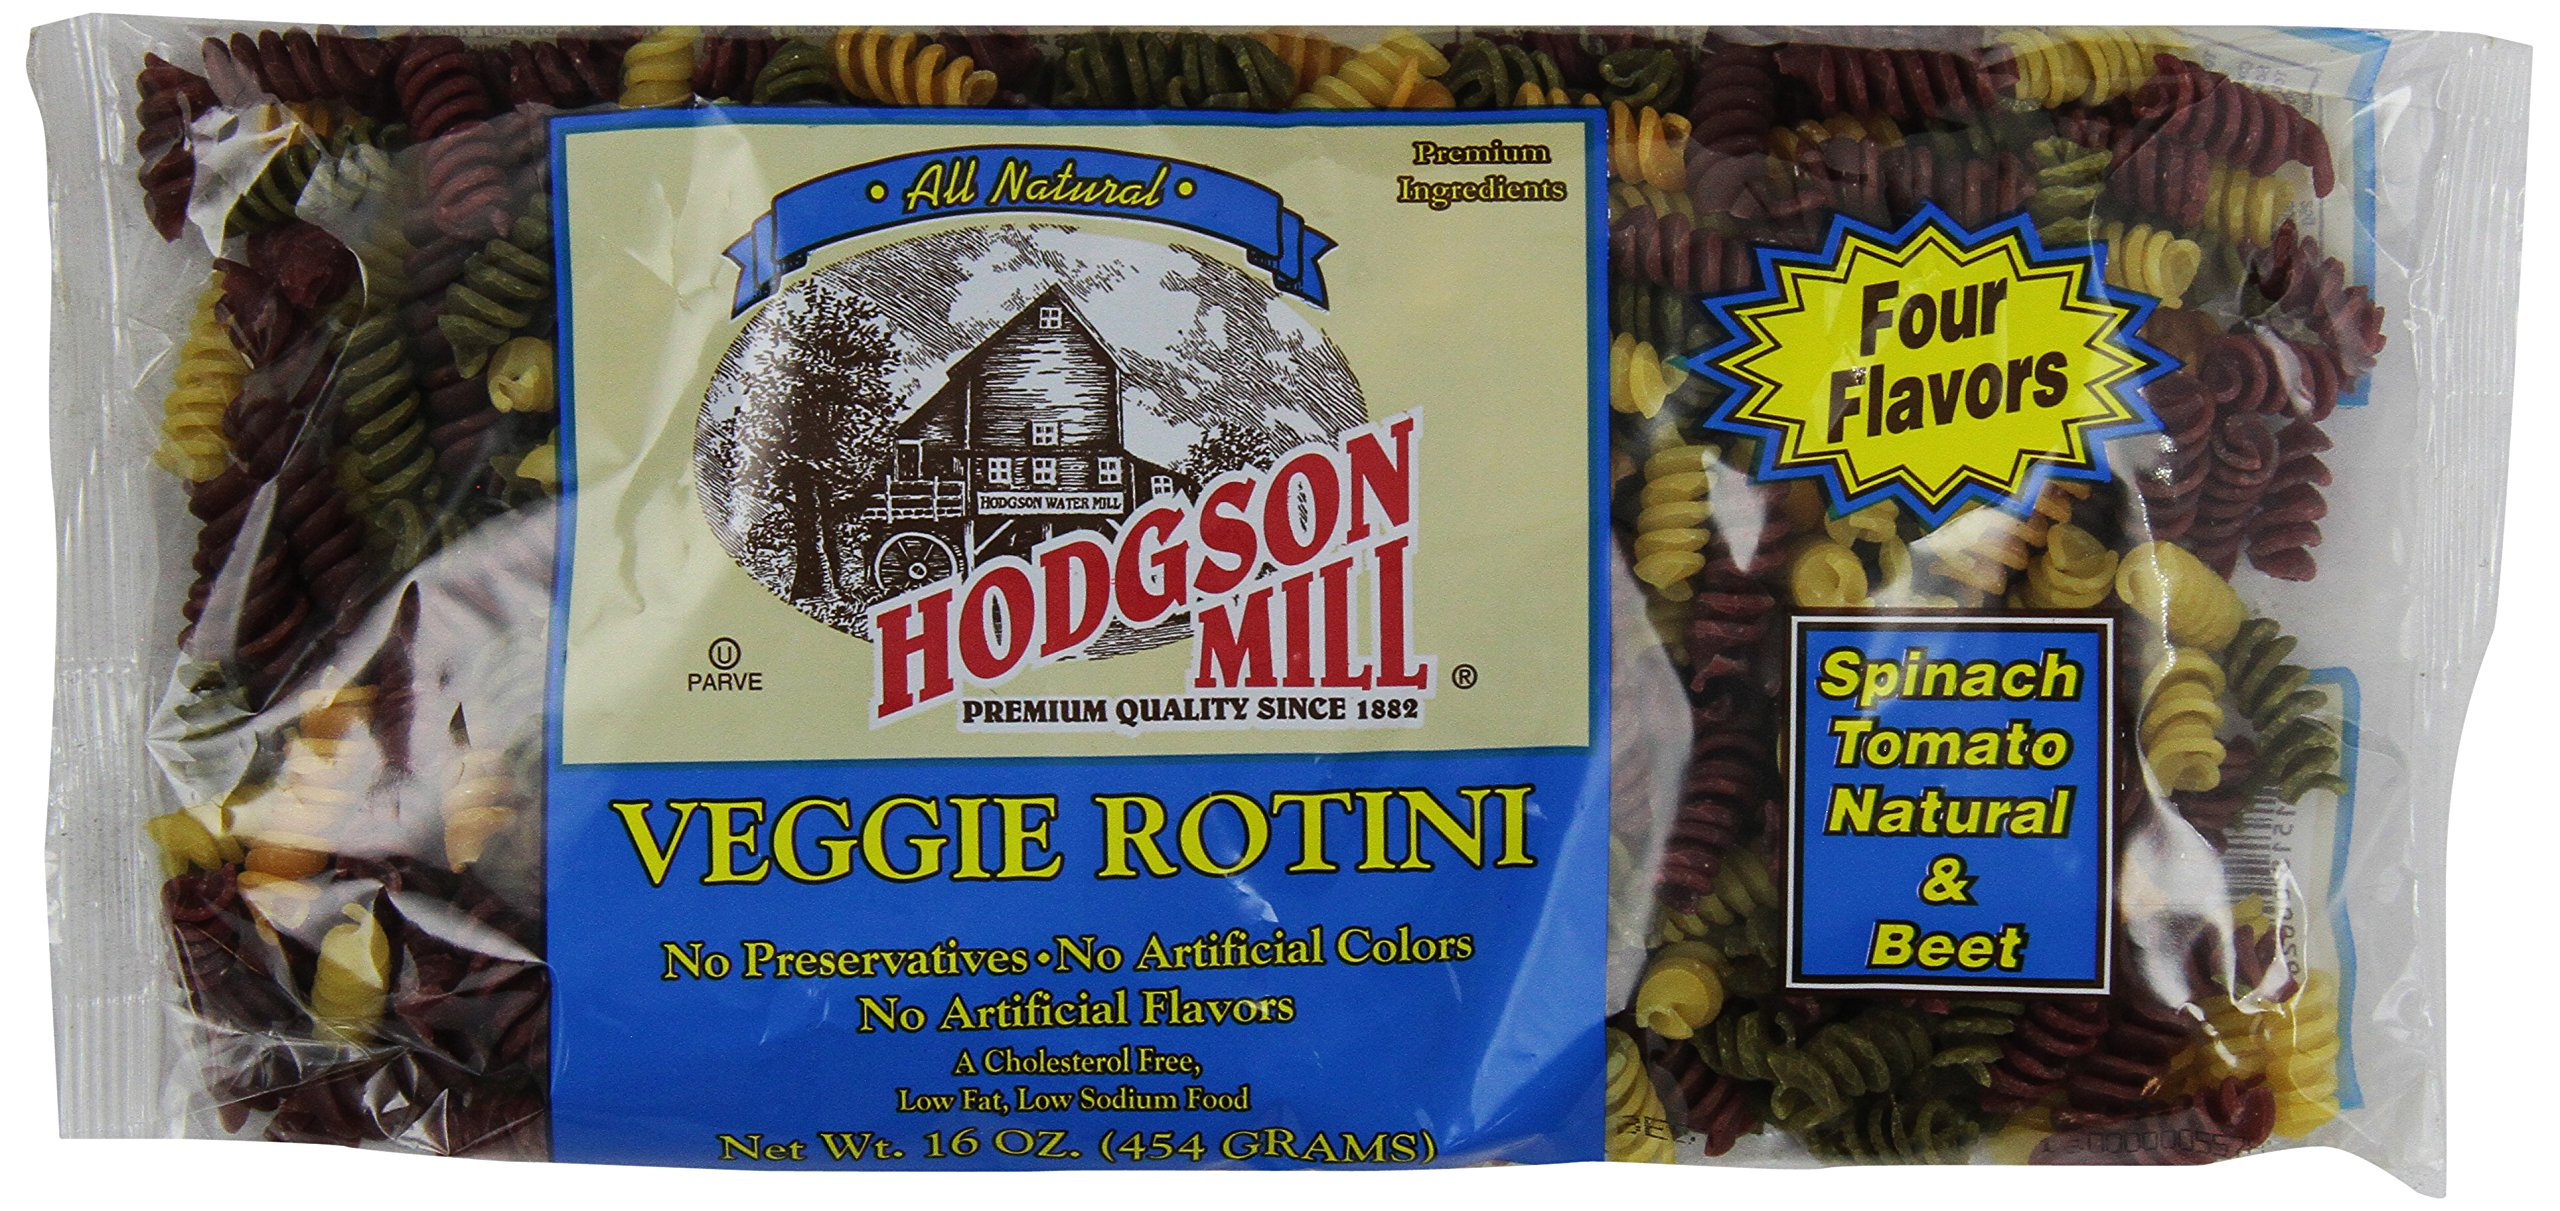 Hodgson Whole Wheat Veggie Rotini, 4 Natural Flavor, 16 oz